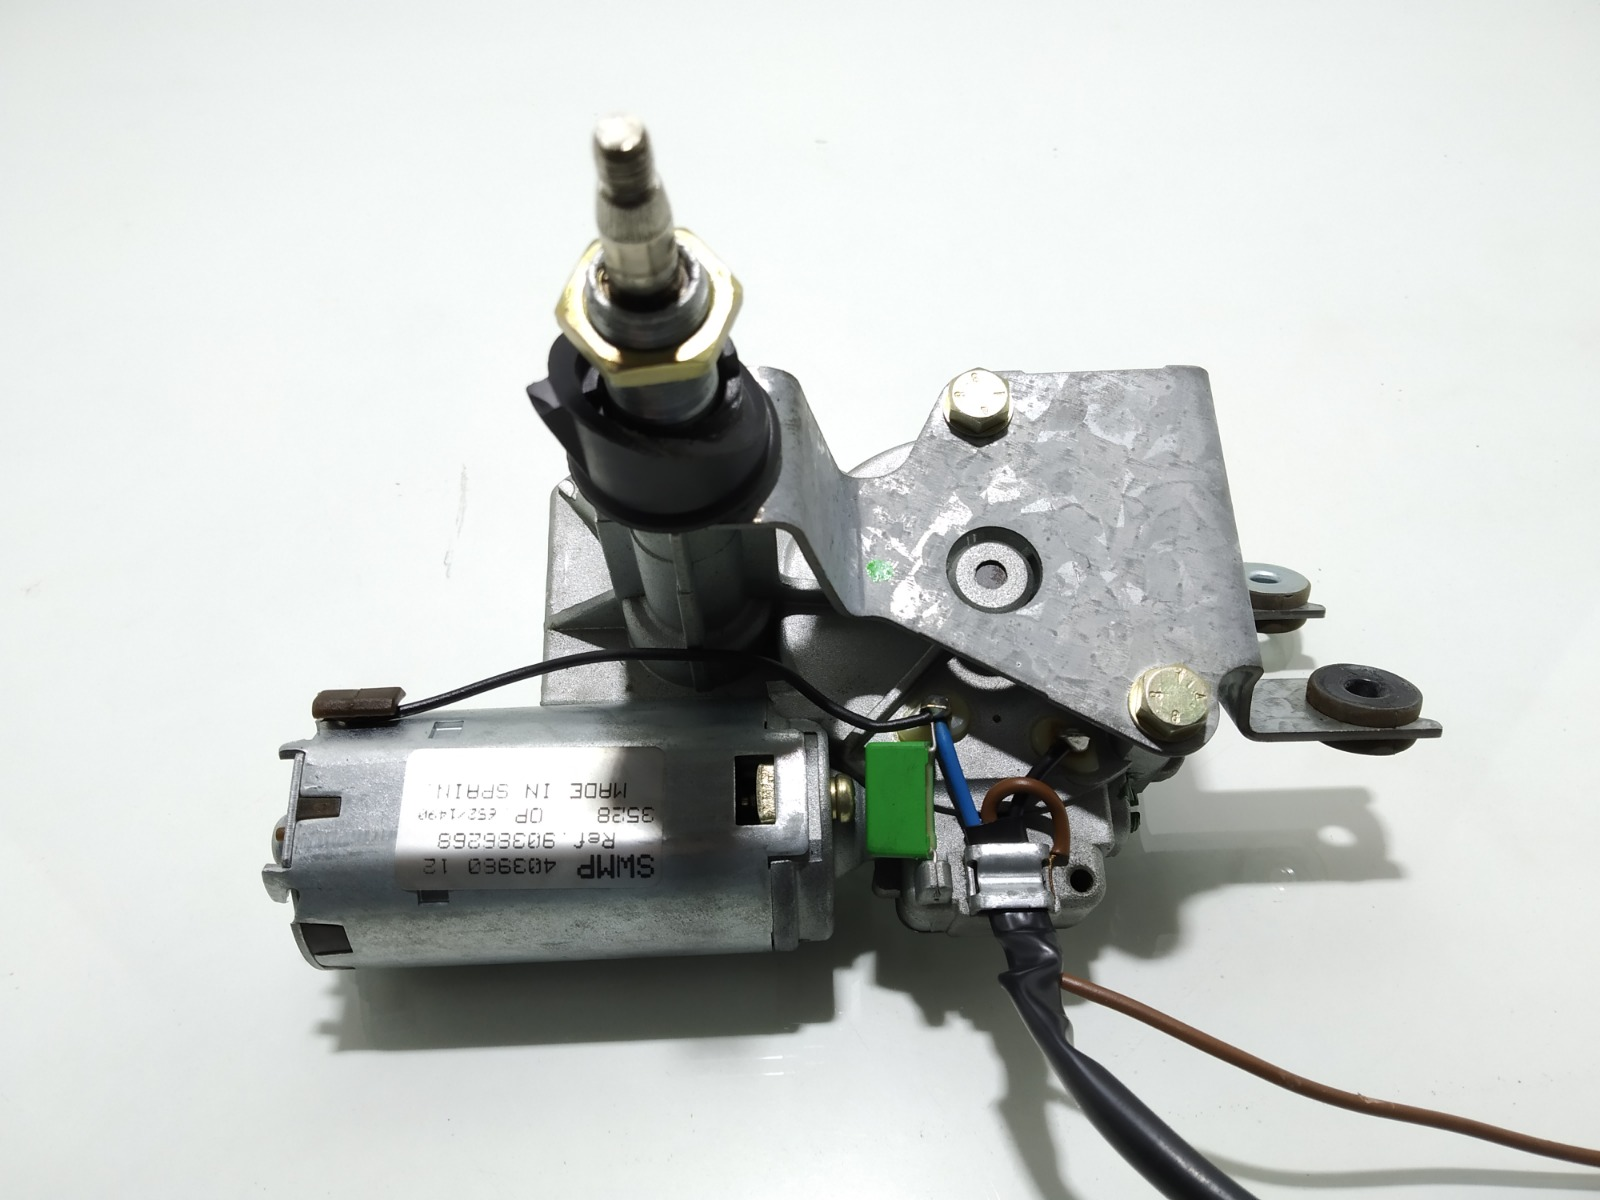 Моторчик заднего стеклоочистителя (дворника) Opel Corsa B 1.2 I 1999 (б/у)